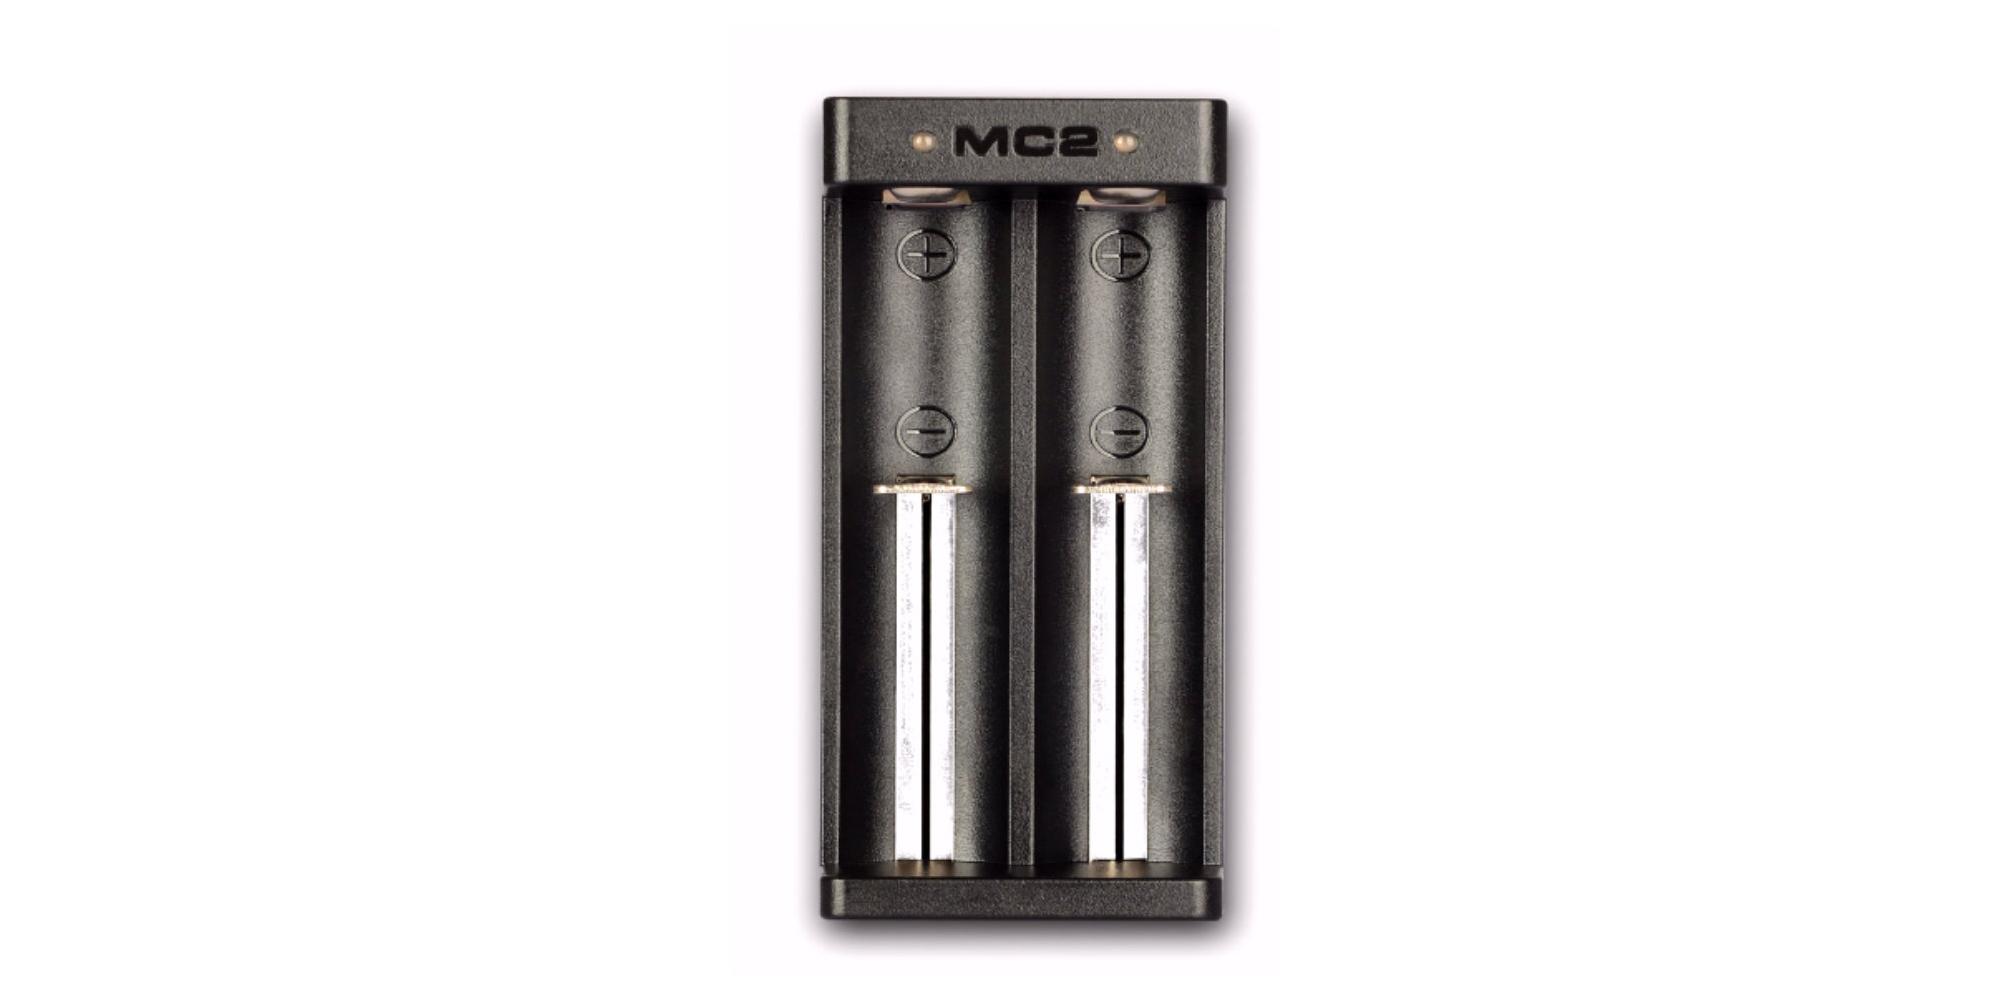 XTAR MC2 Battery Charger